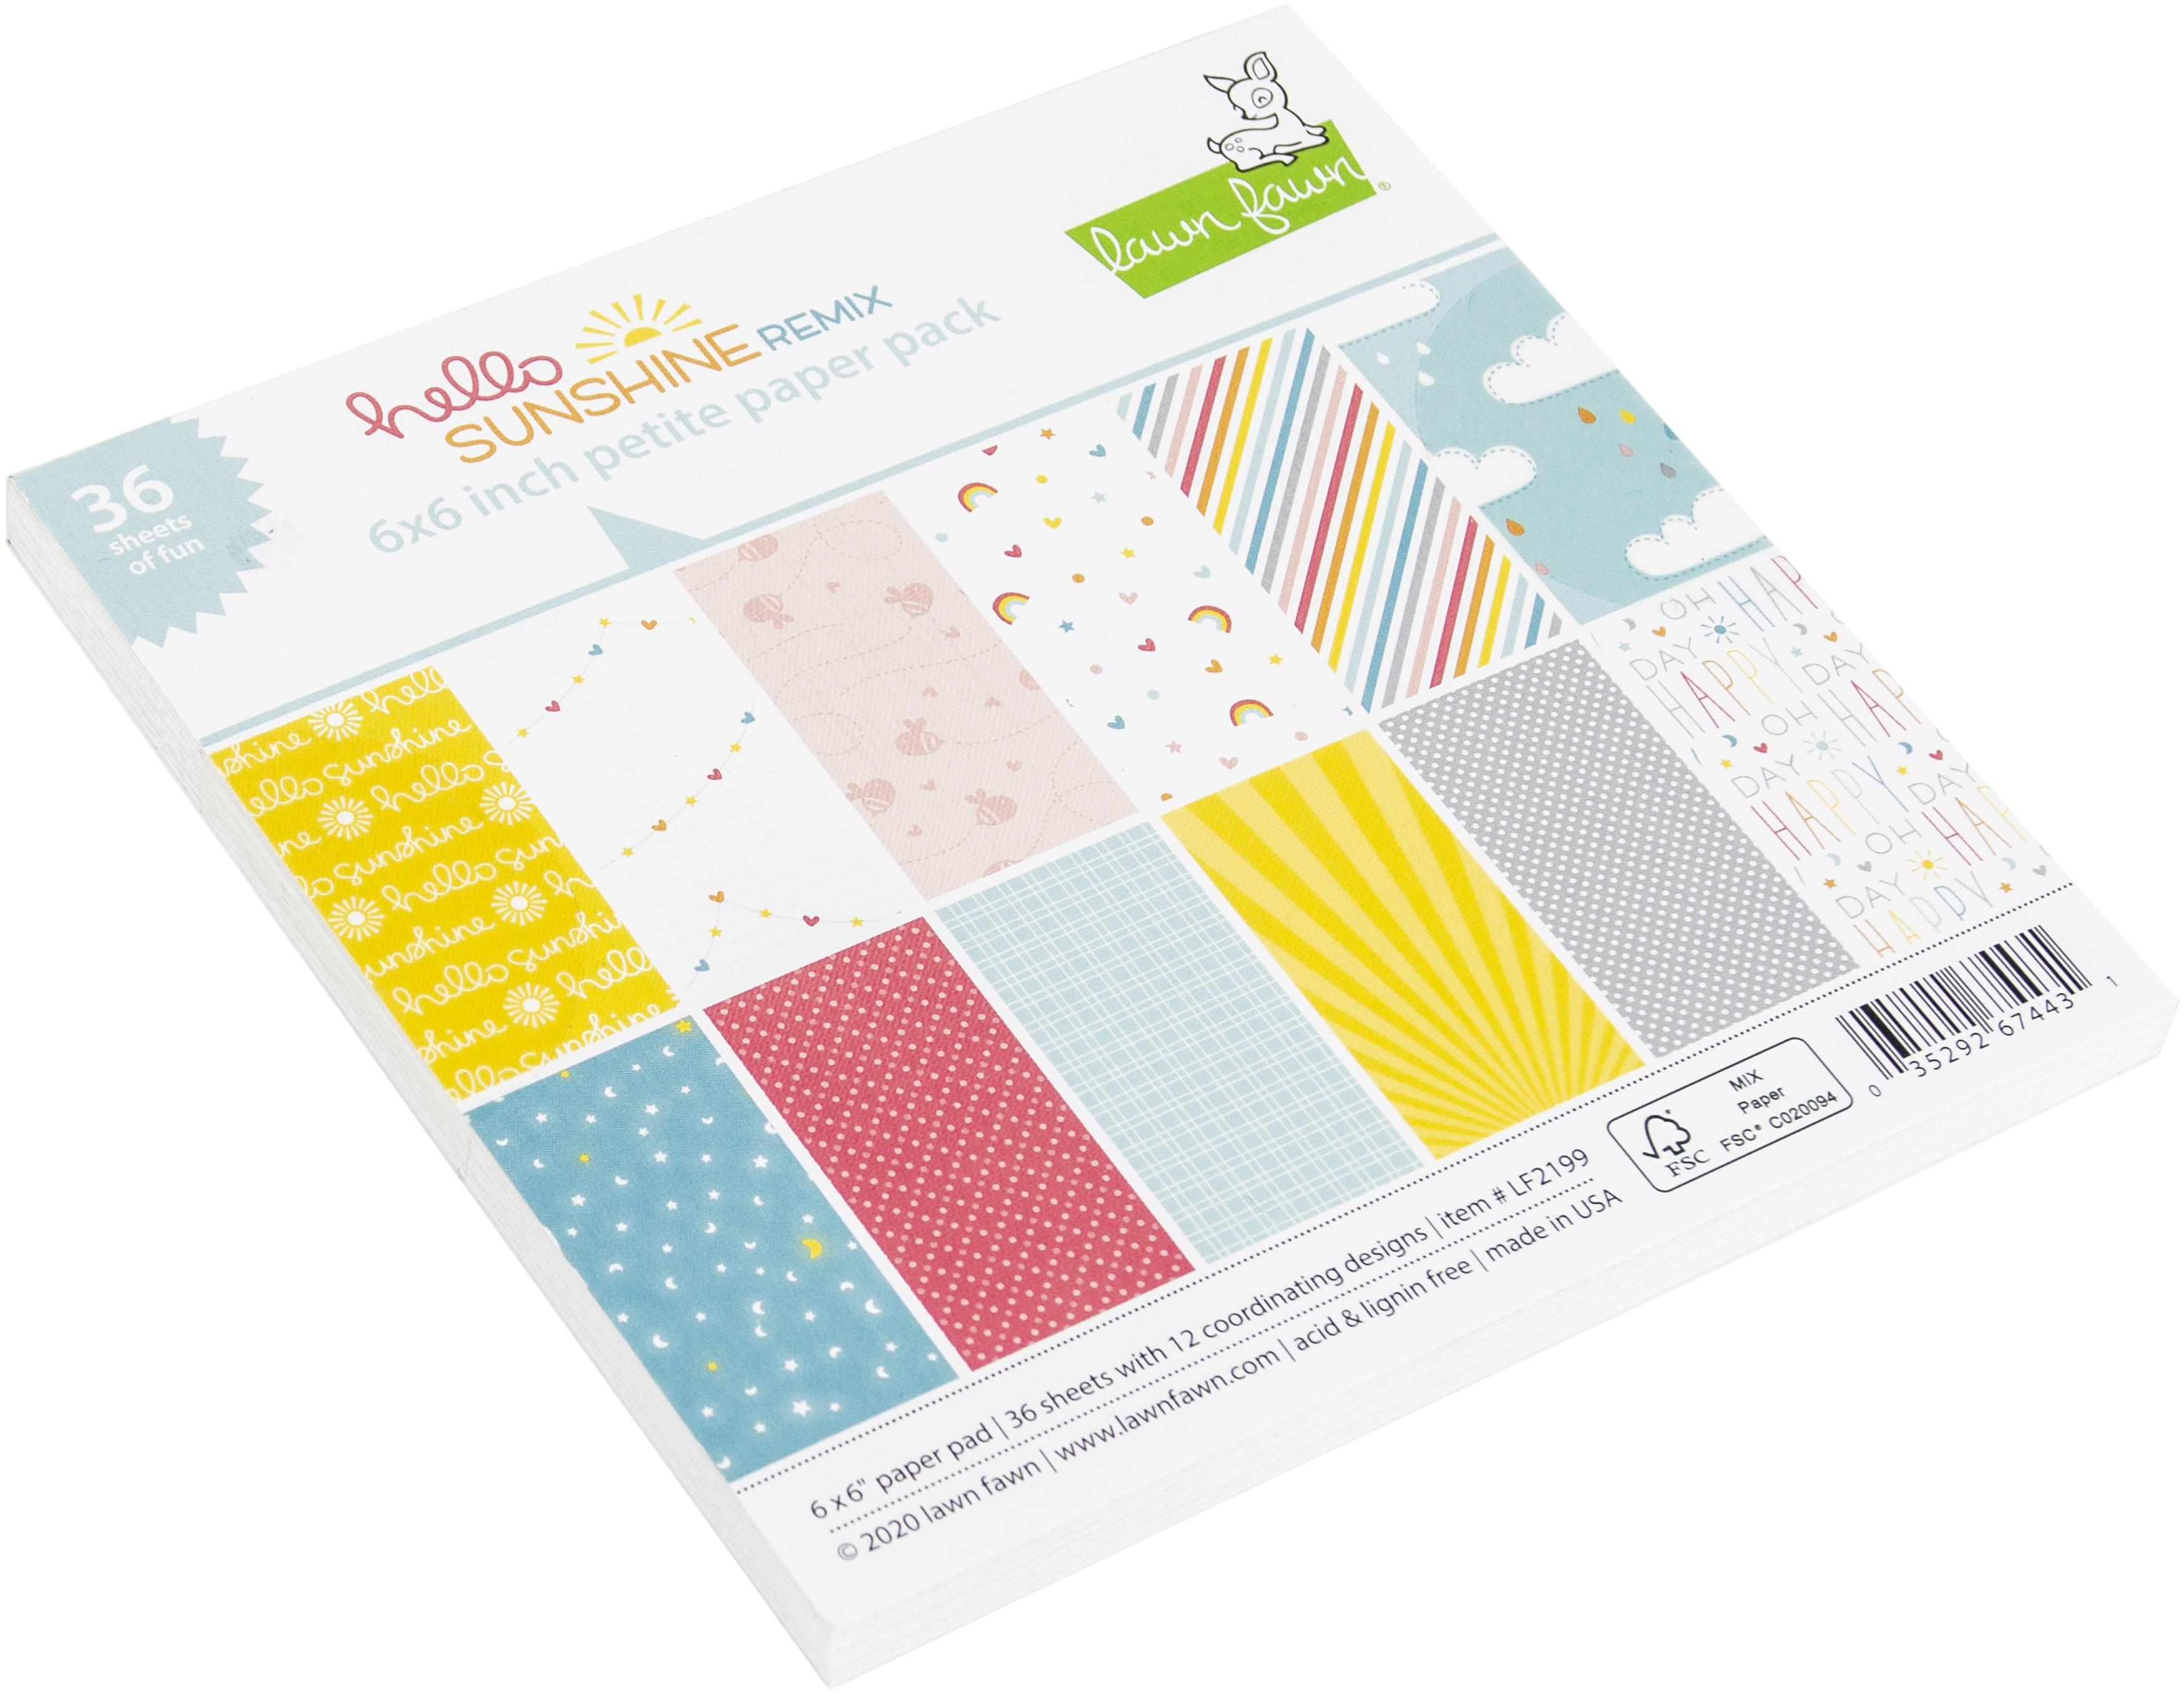 Lawn Fawn Single-Sided Petite Paper Pack 6X6 36/Pkg-Hello Sunshine Remix, 12 Designs/3 Each